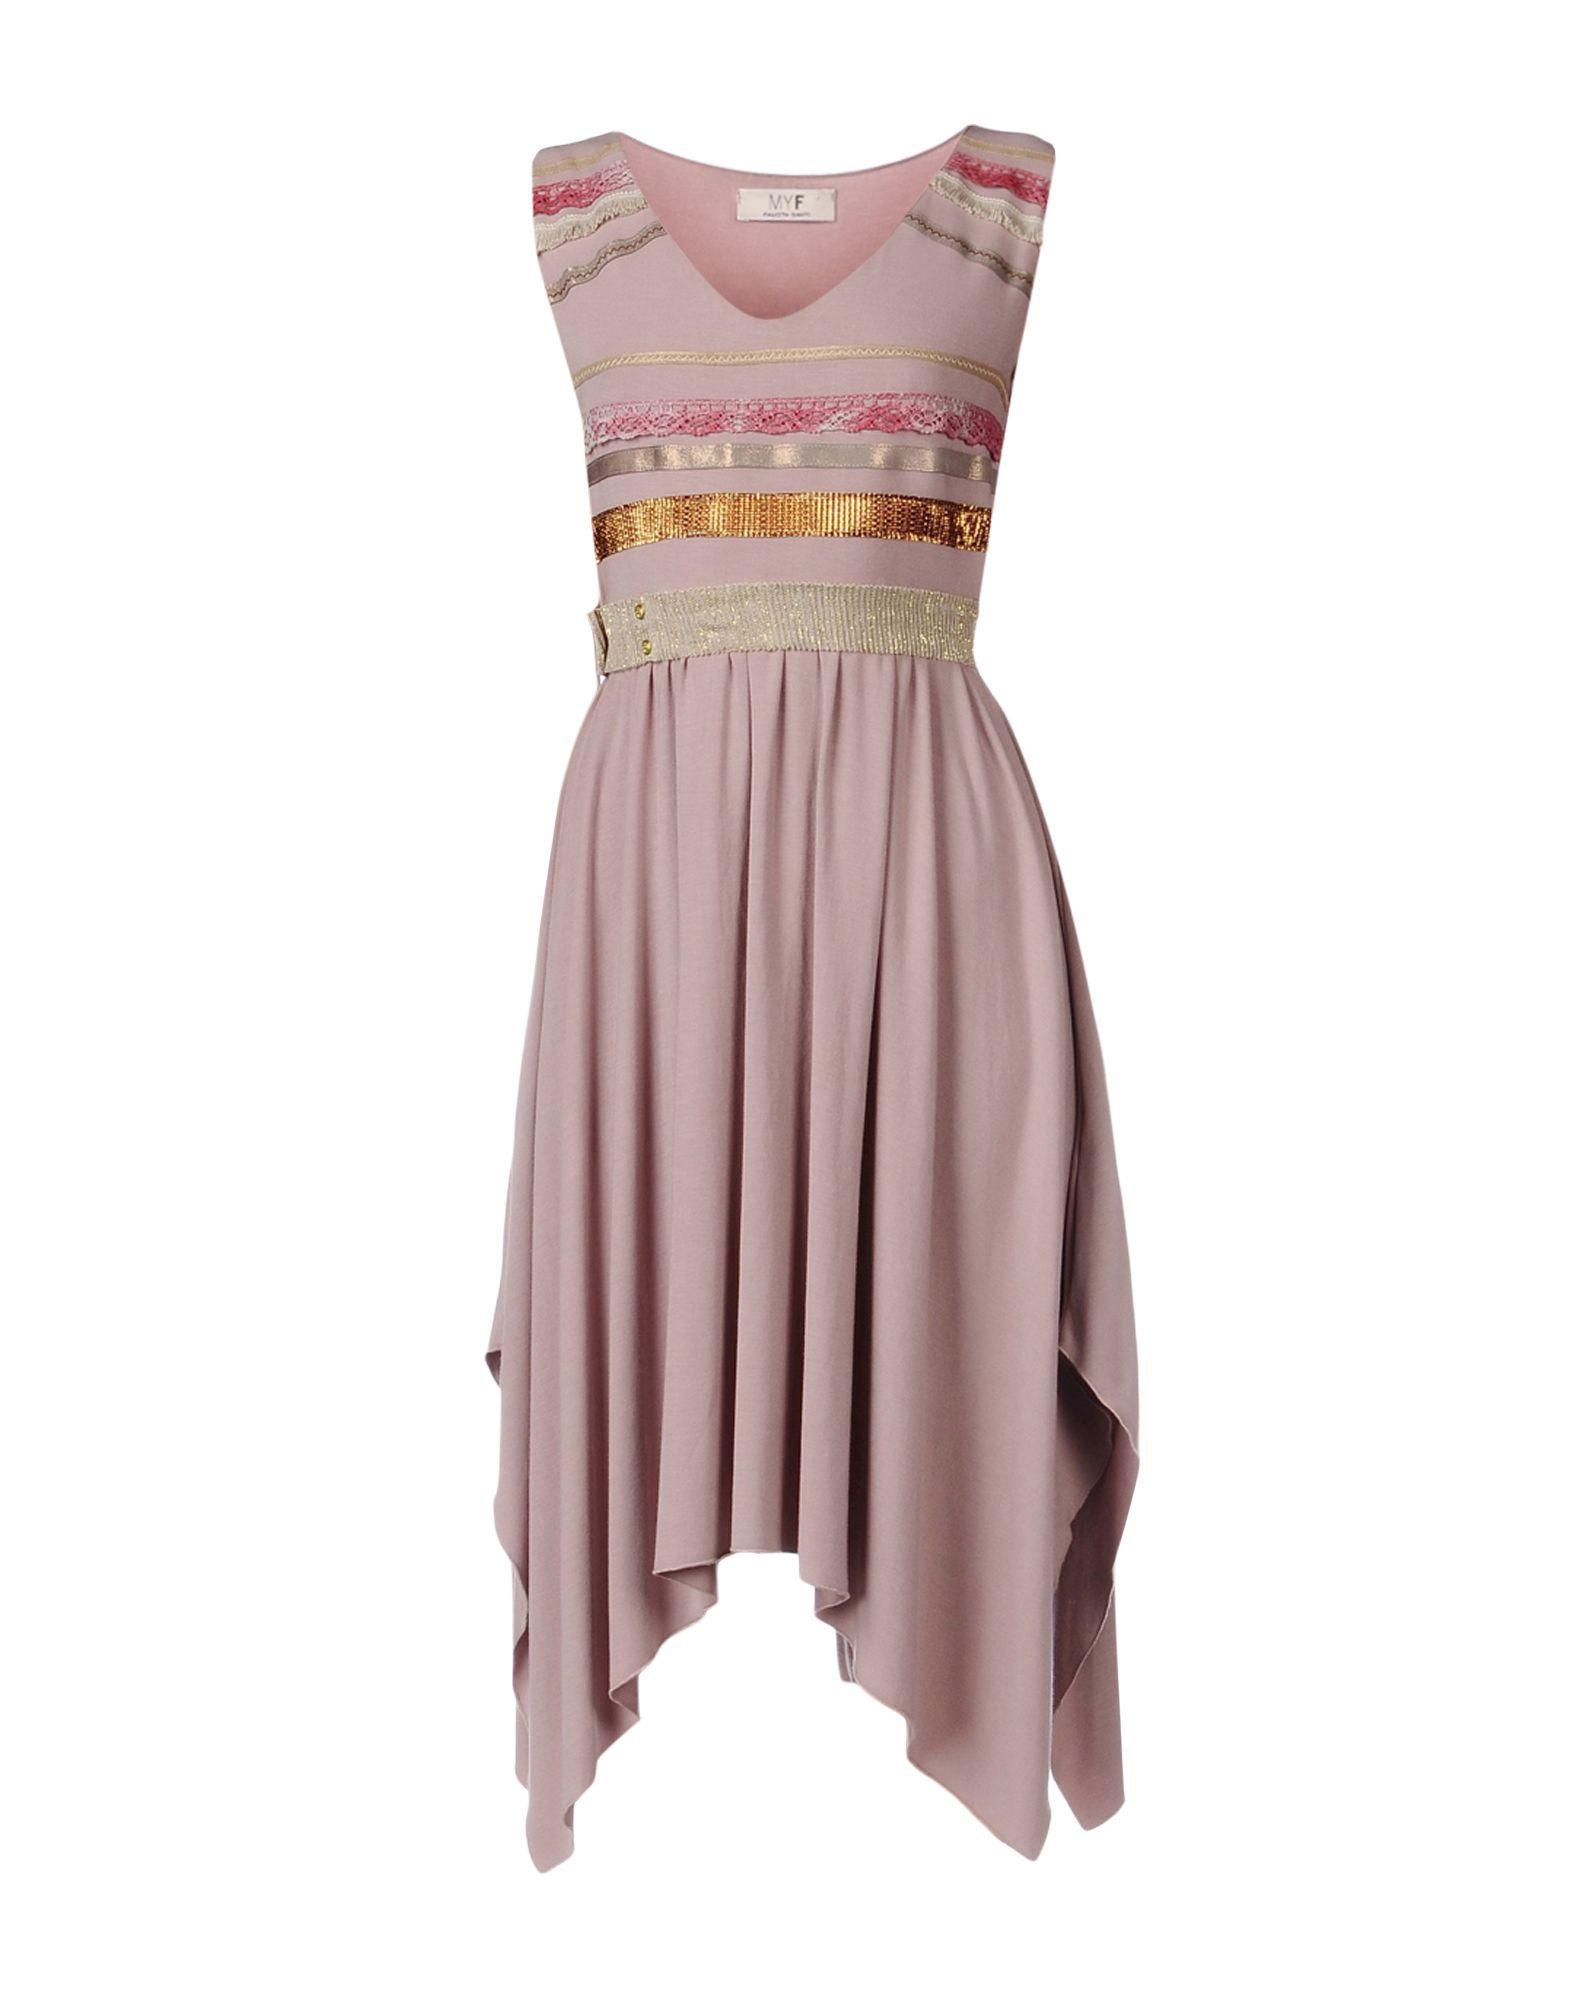 DRESSES - Short dresses Myf q8NE3A